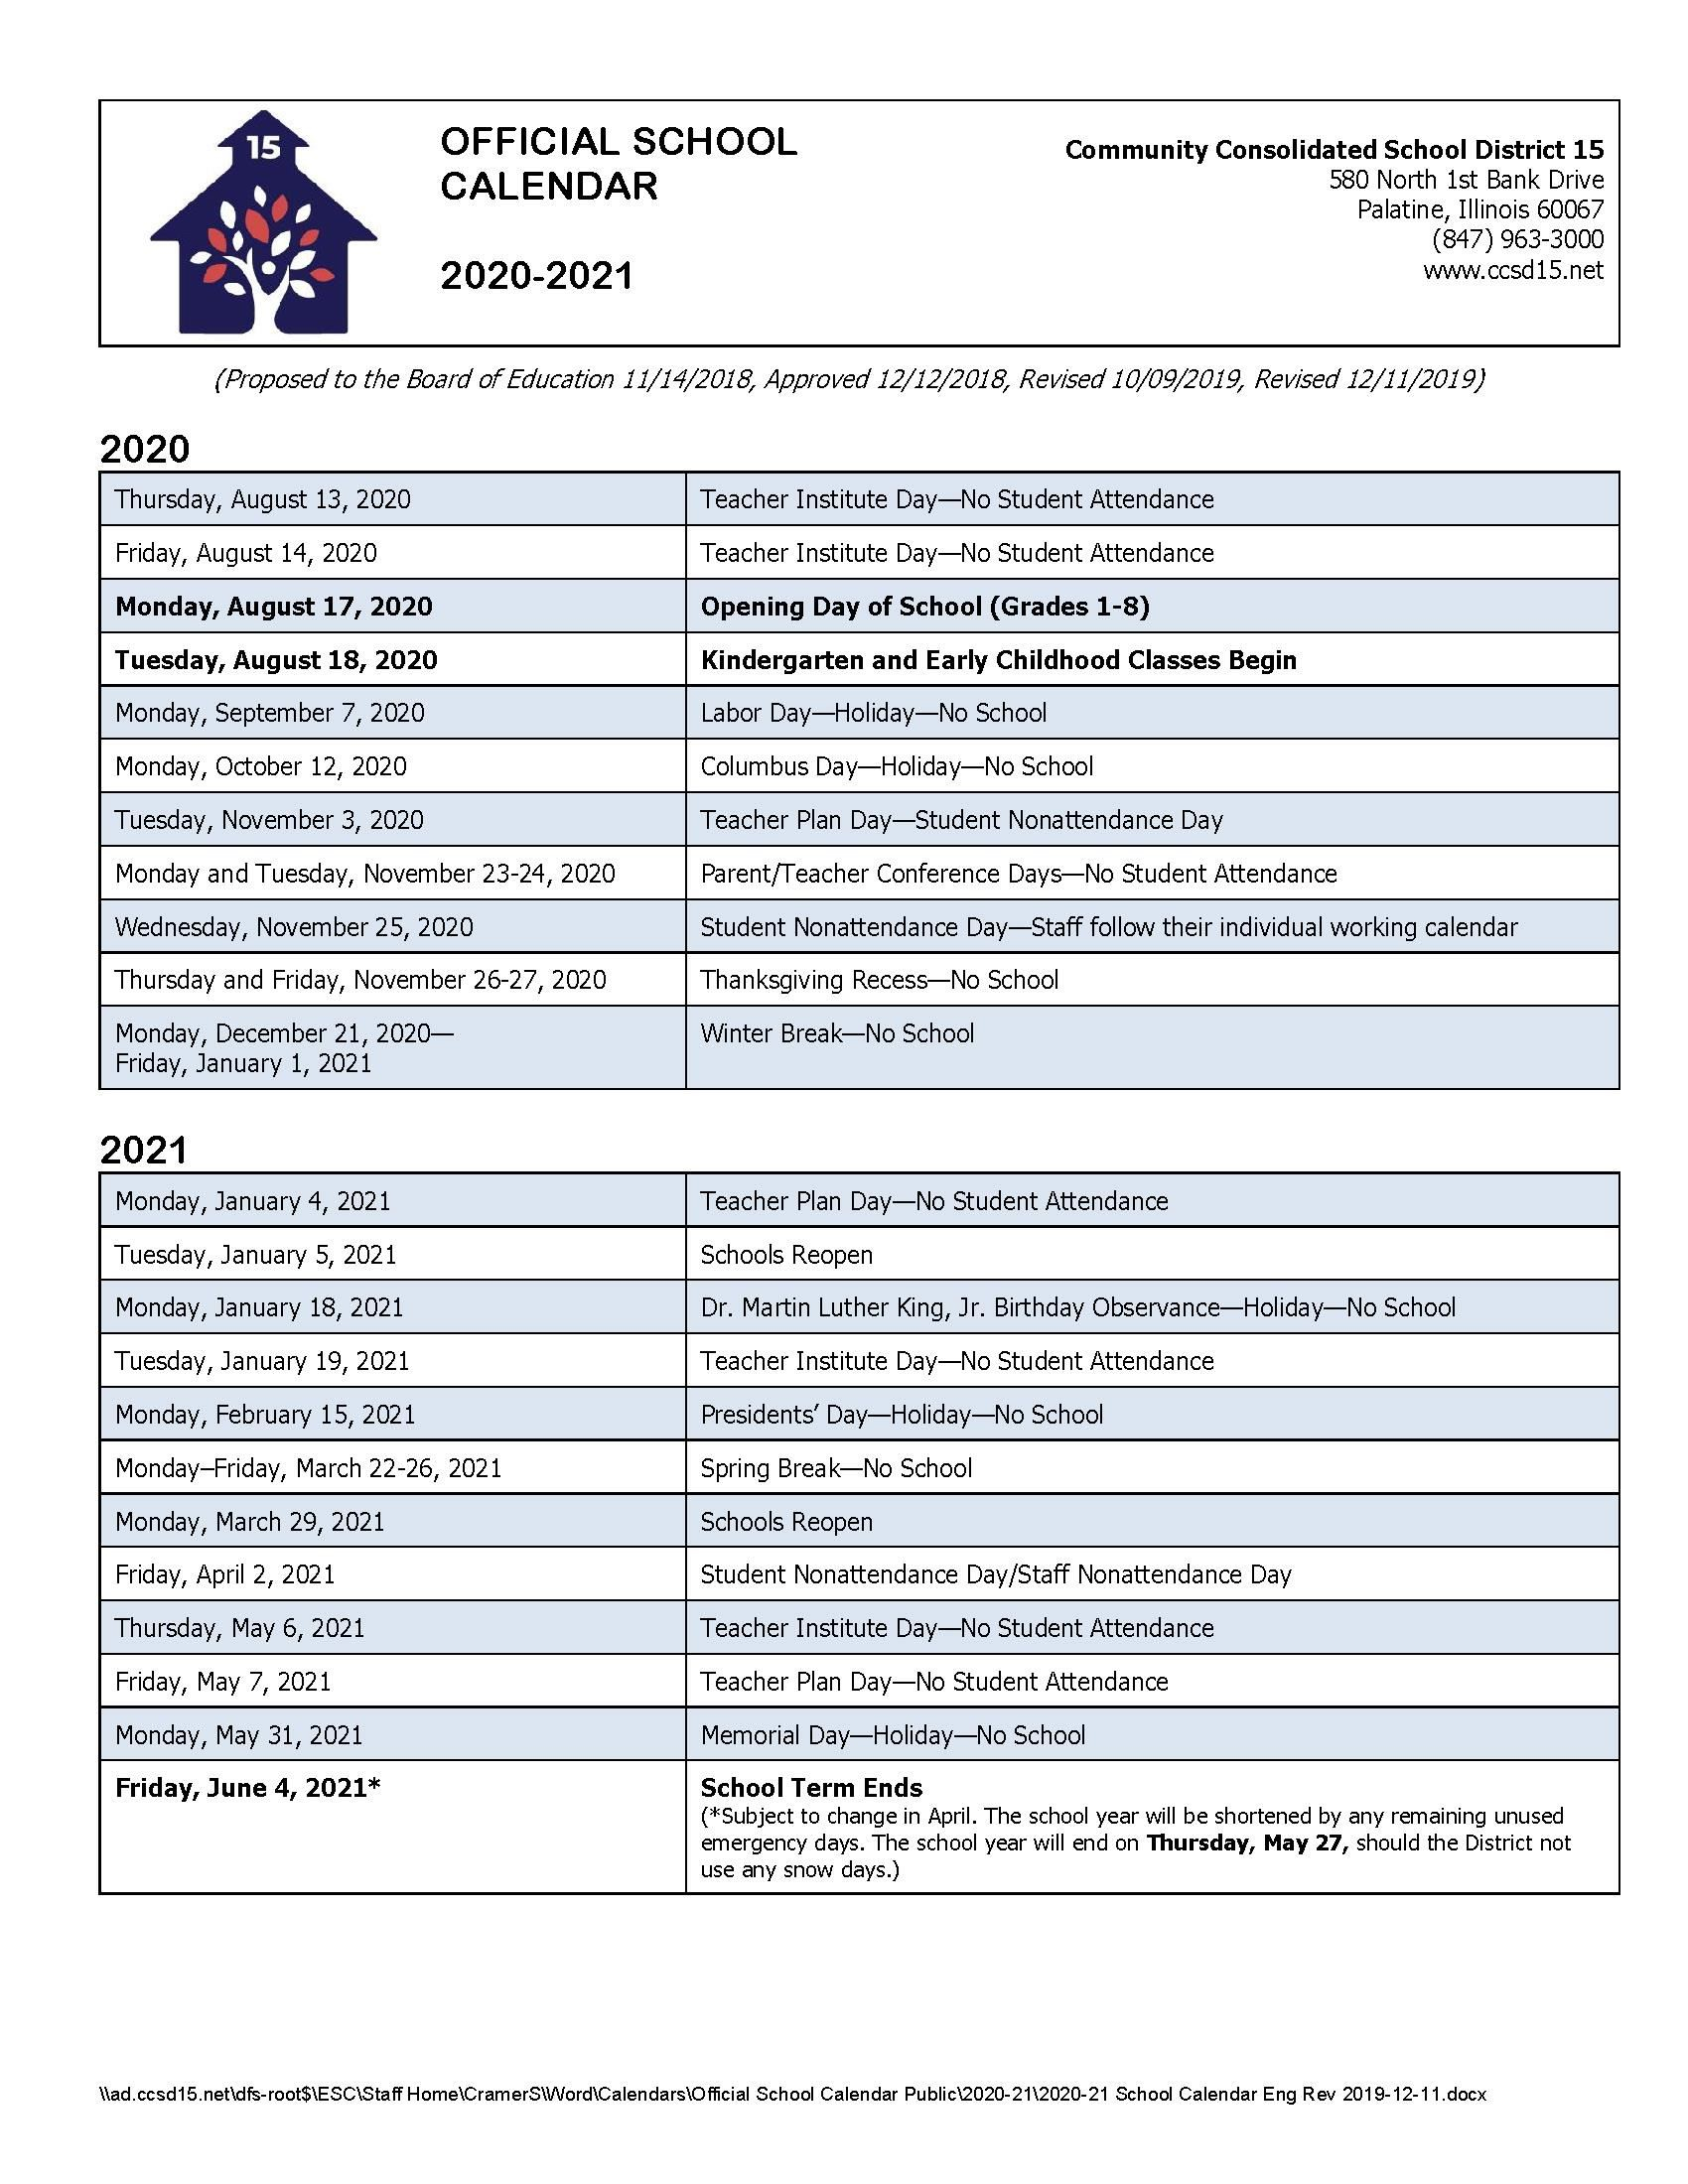 Calendars / 2020 21 Official School Calendar Intended For West Clark Community School Calendar 2021 20